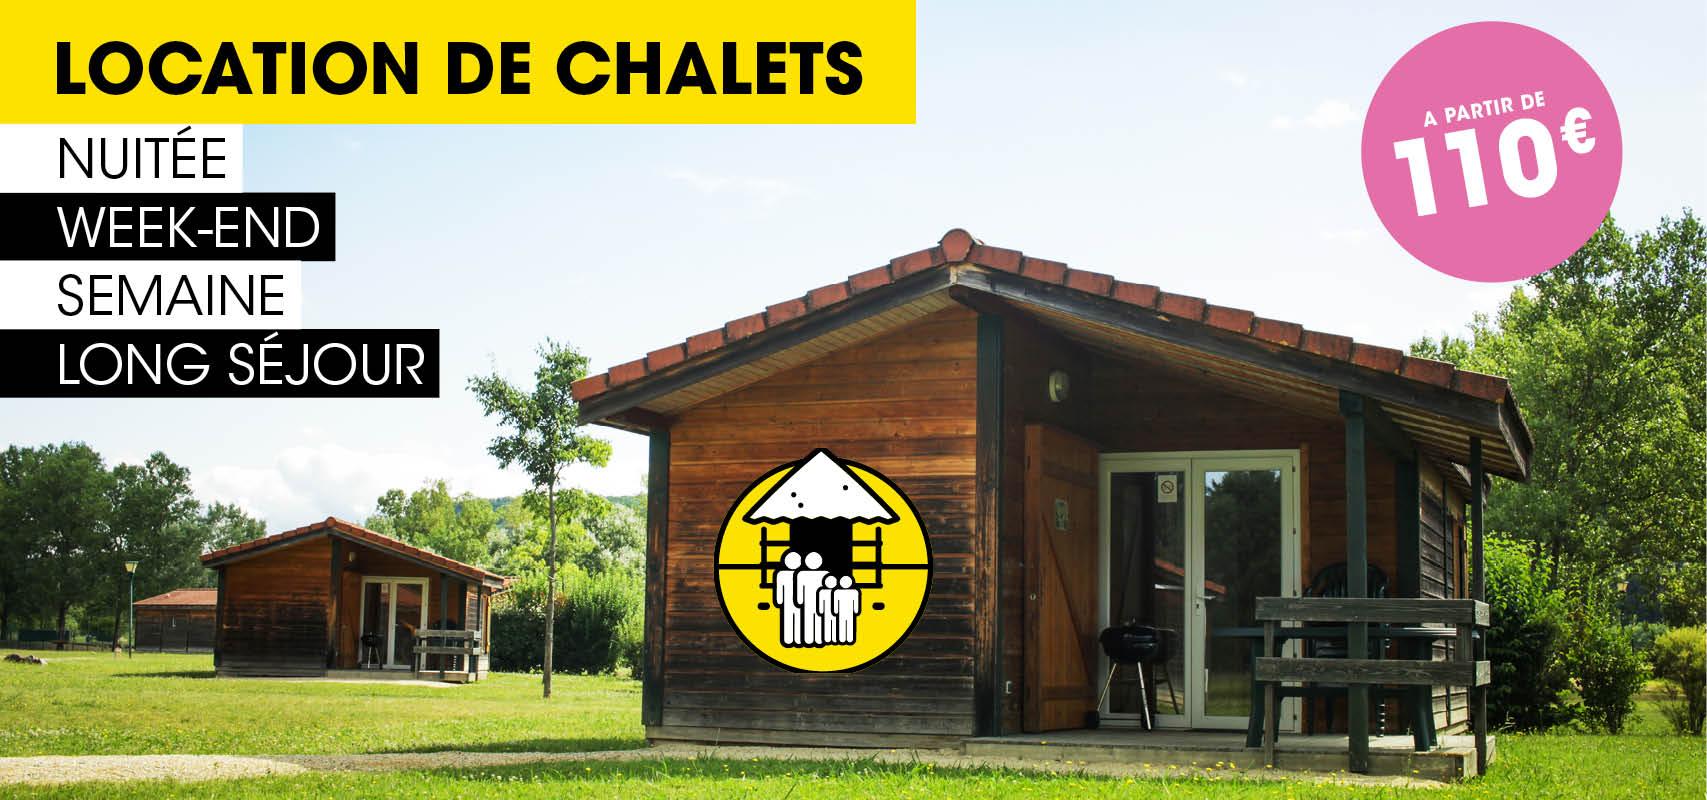 Chalet-Condrieu-web